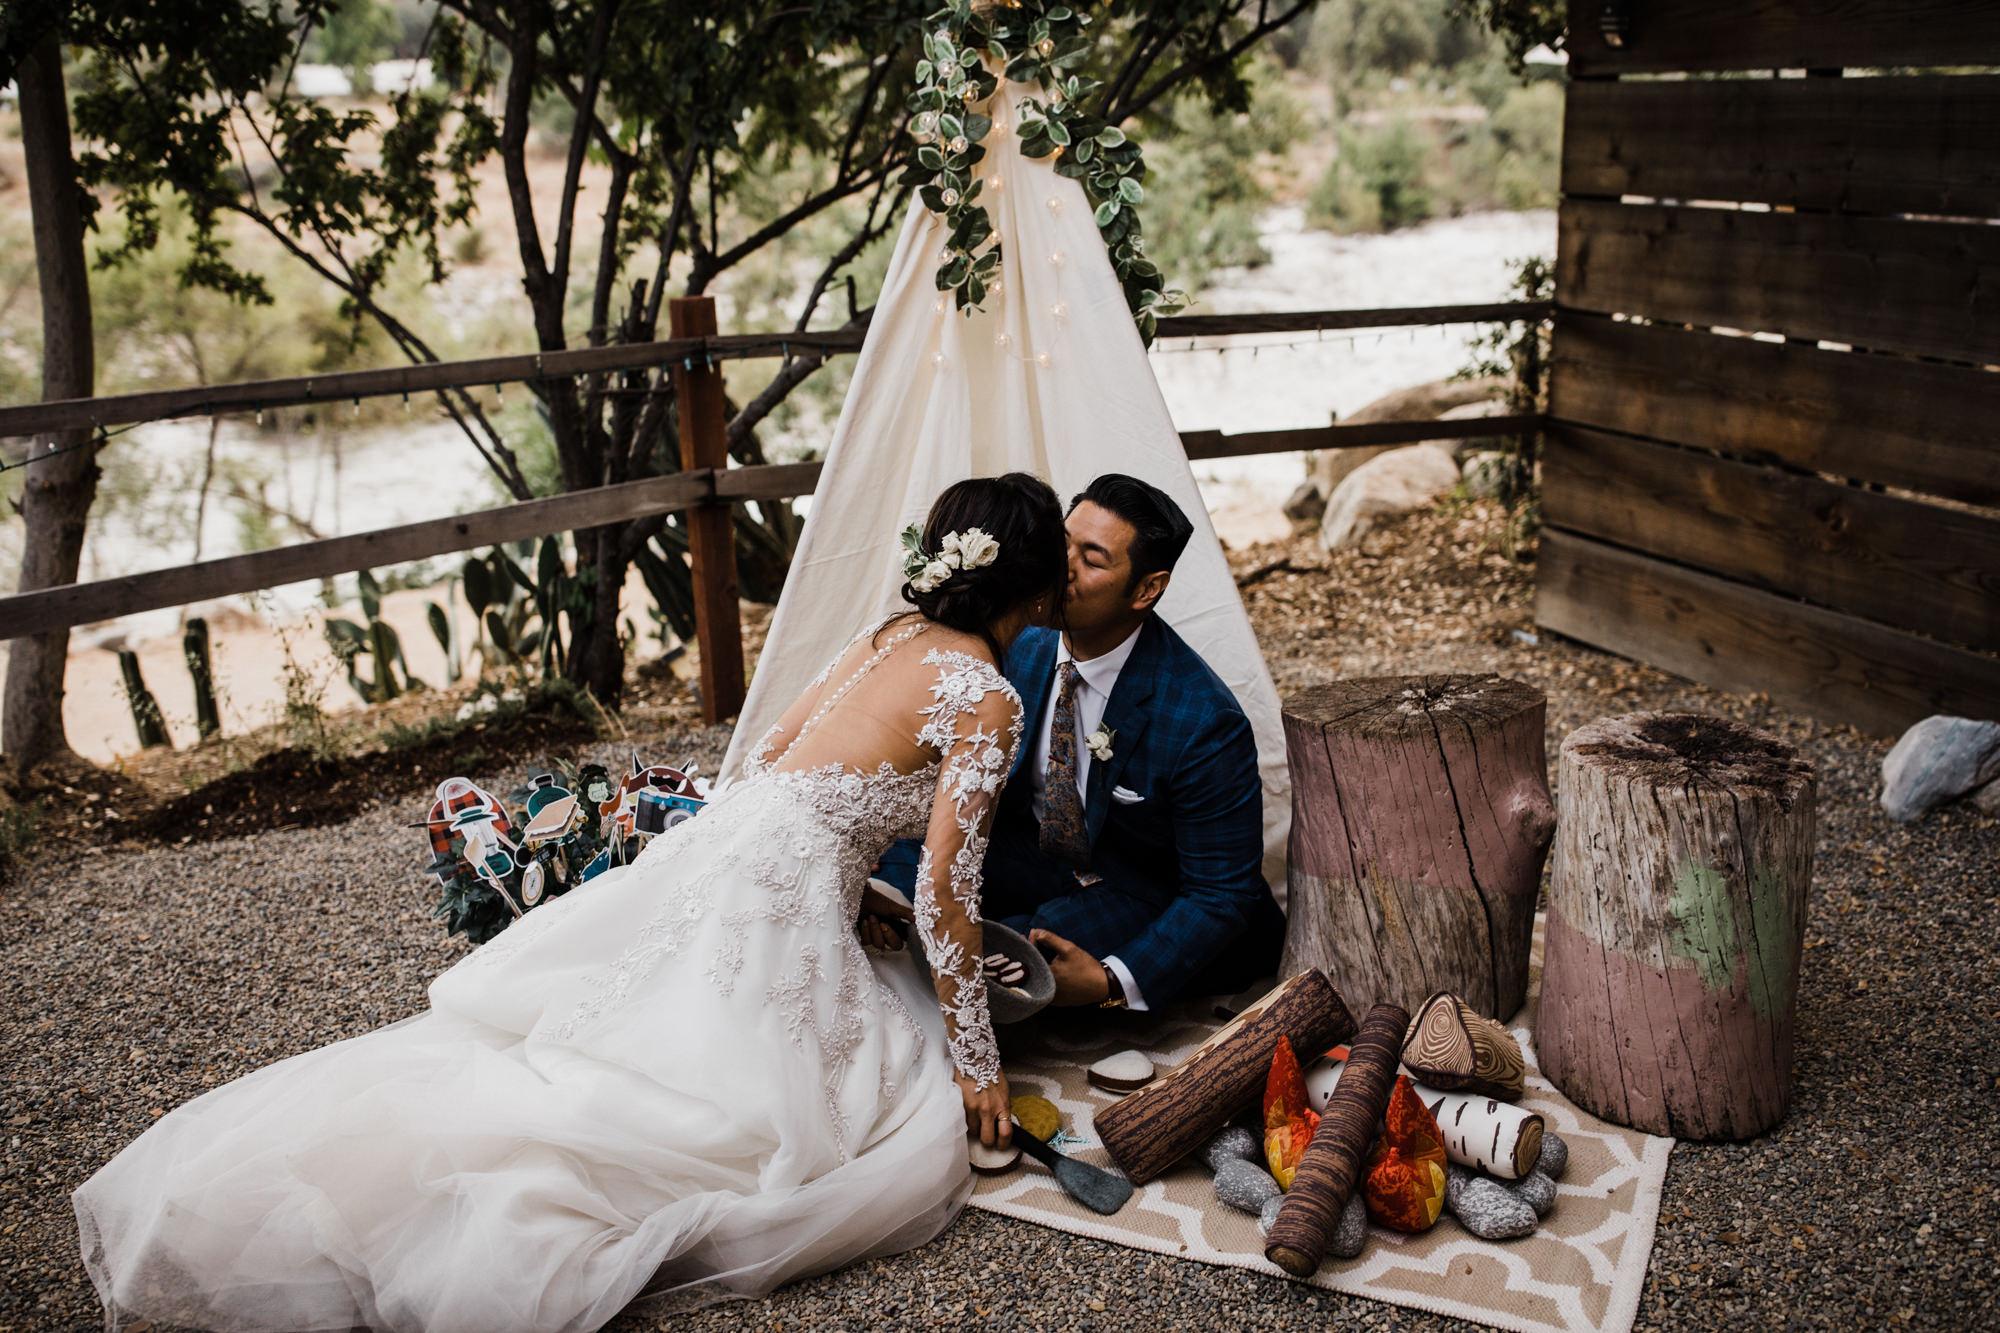 intimate wedding in sequoia national park | destination adventure wedding photographers | the hearnes adventure photography | www.thehearnes.com